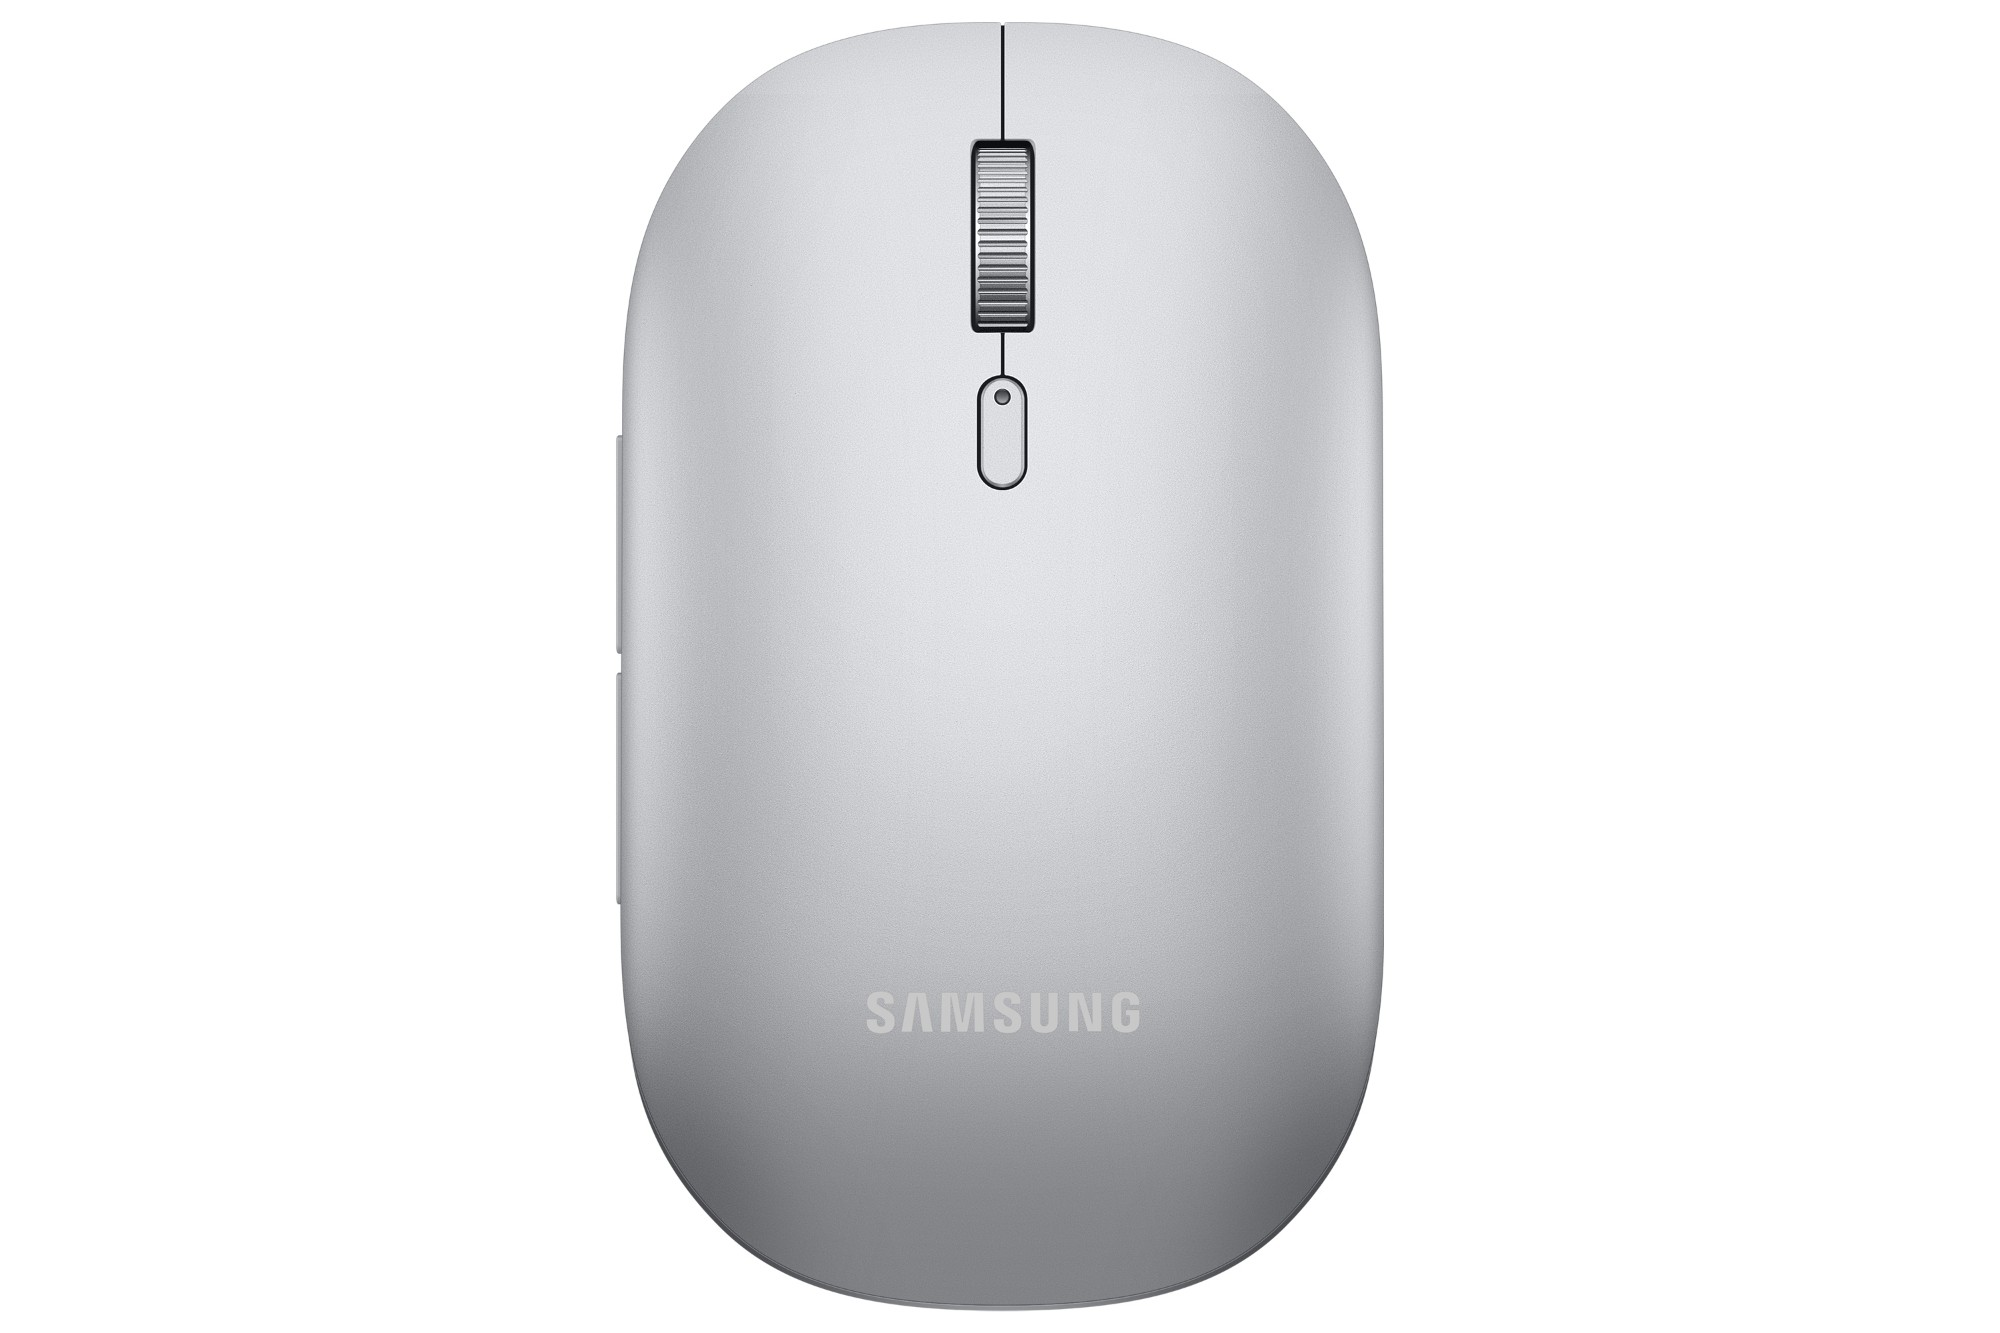 Samsung EJ-M3400 mouse Ambidextrous Bluetooth